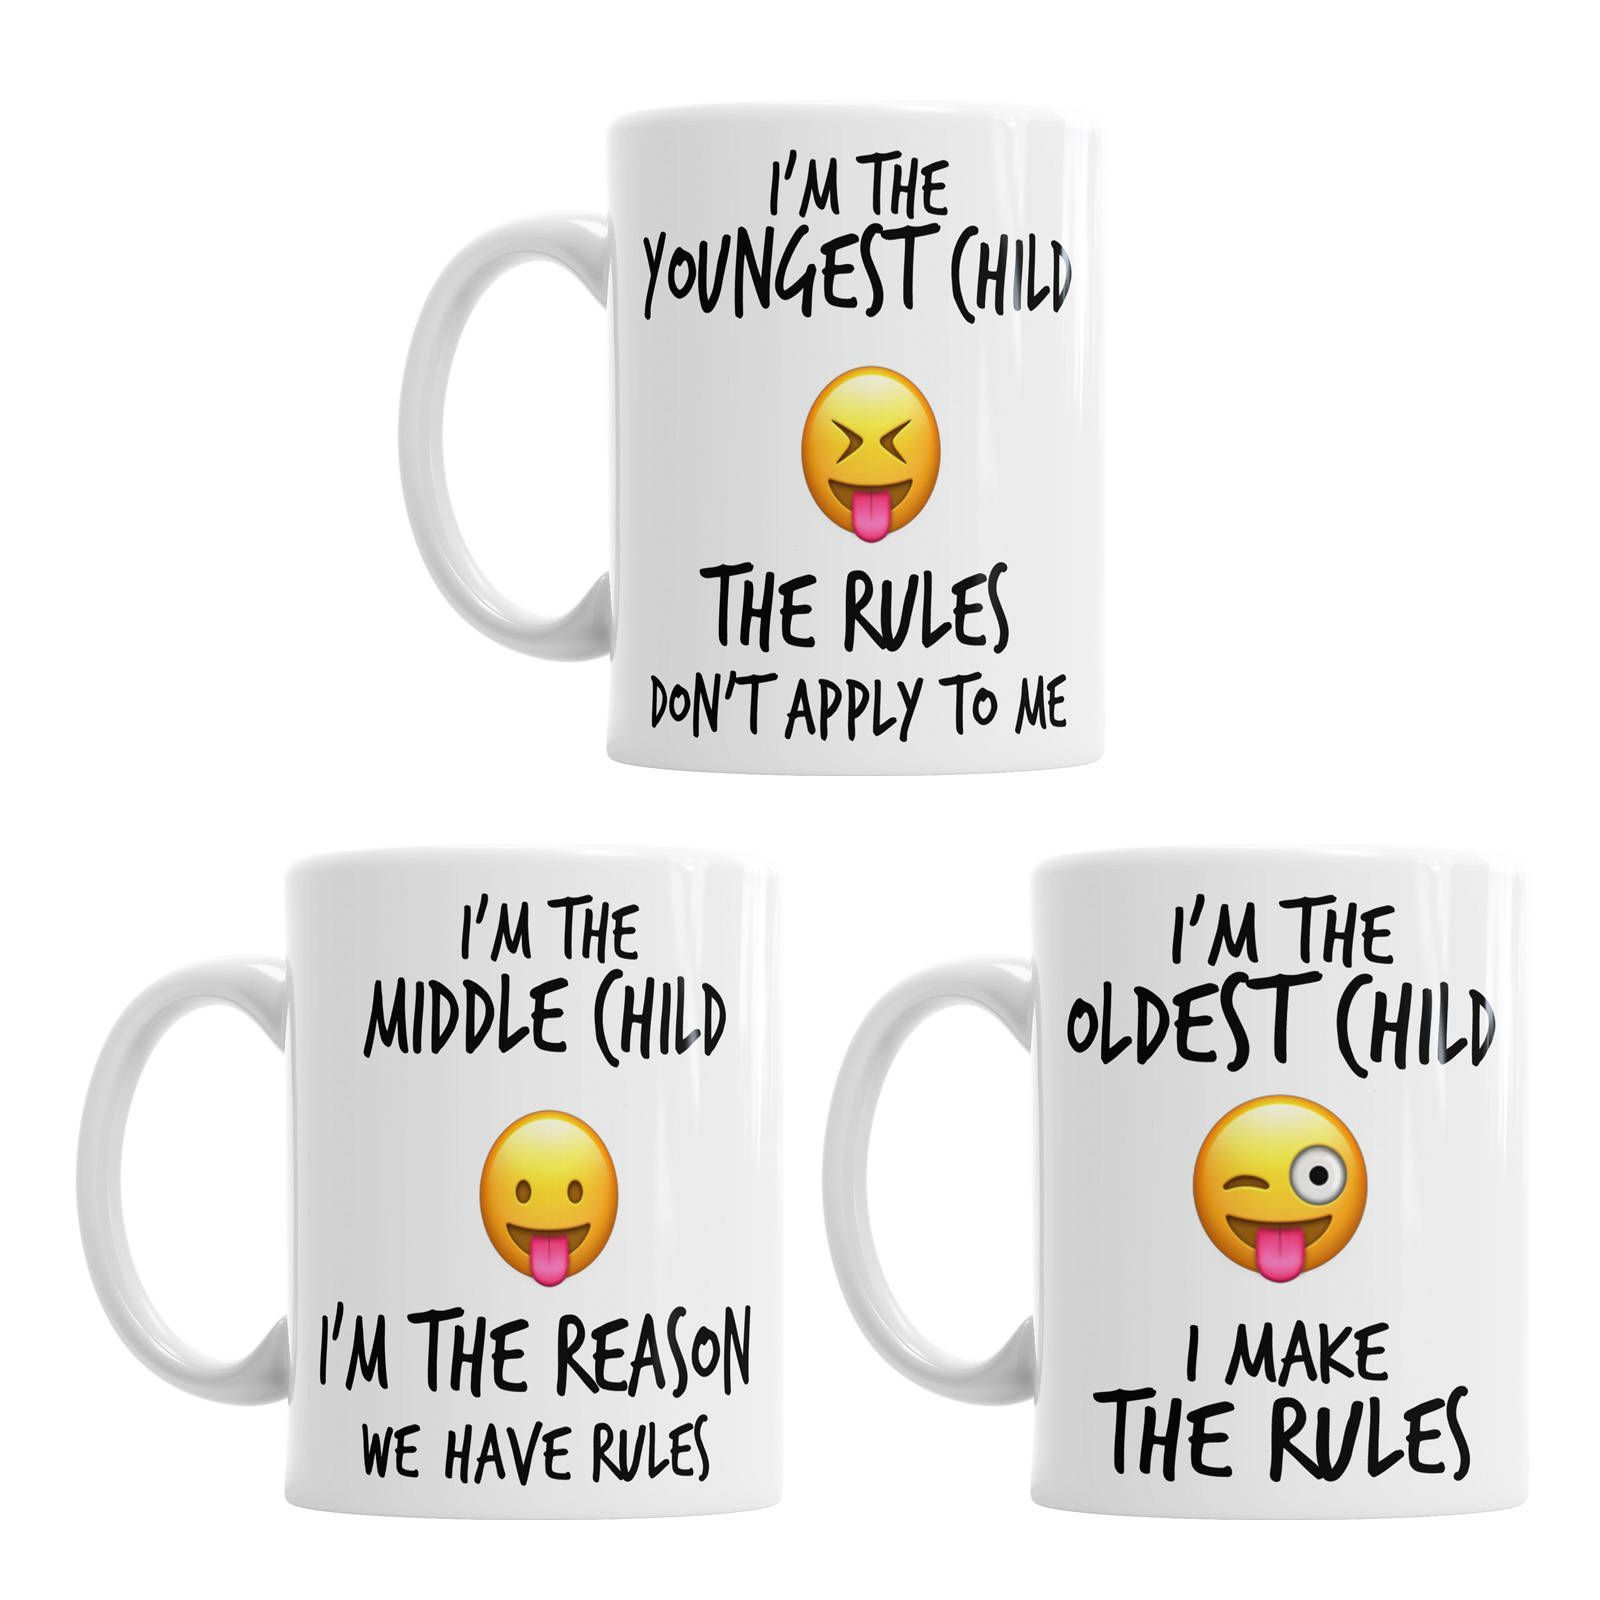 Emoji Coffee Mugs - Emoji Mug Set - Child Rules Mug Set - Older Child Mug - Middle Child Mug - Younger Child Mug - Older Child Gift #middlechildhumor Emoji Coffee Mugs - Emoji Mug Set - Child Rules Mug Set - Older Child Mug - Middle Child Mug - Younger Child Mug - Older Child Gift #middlechildhumor